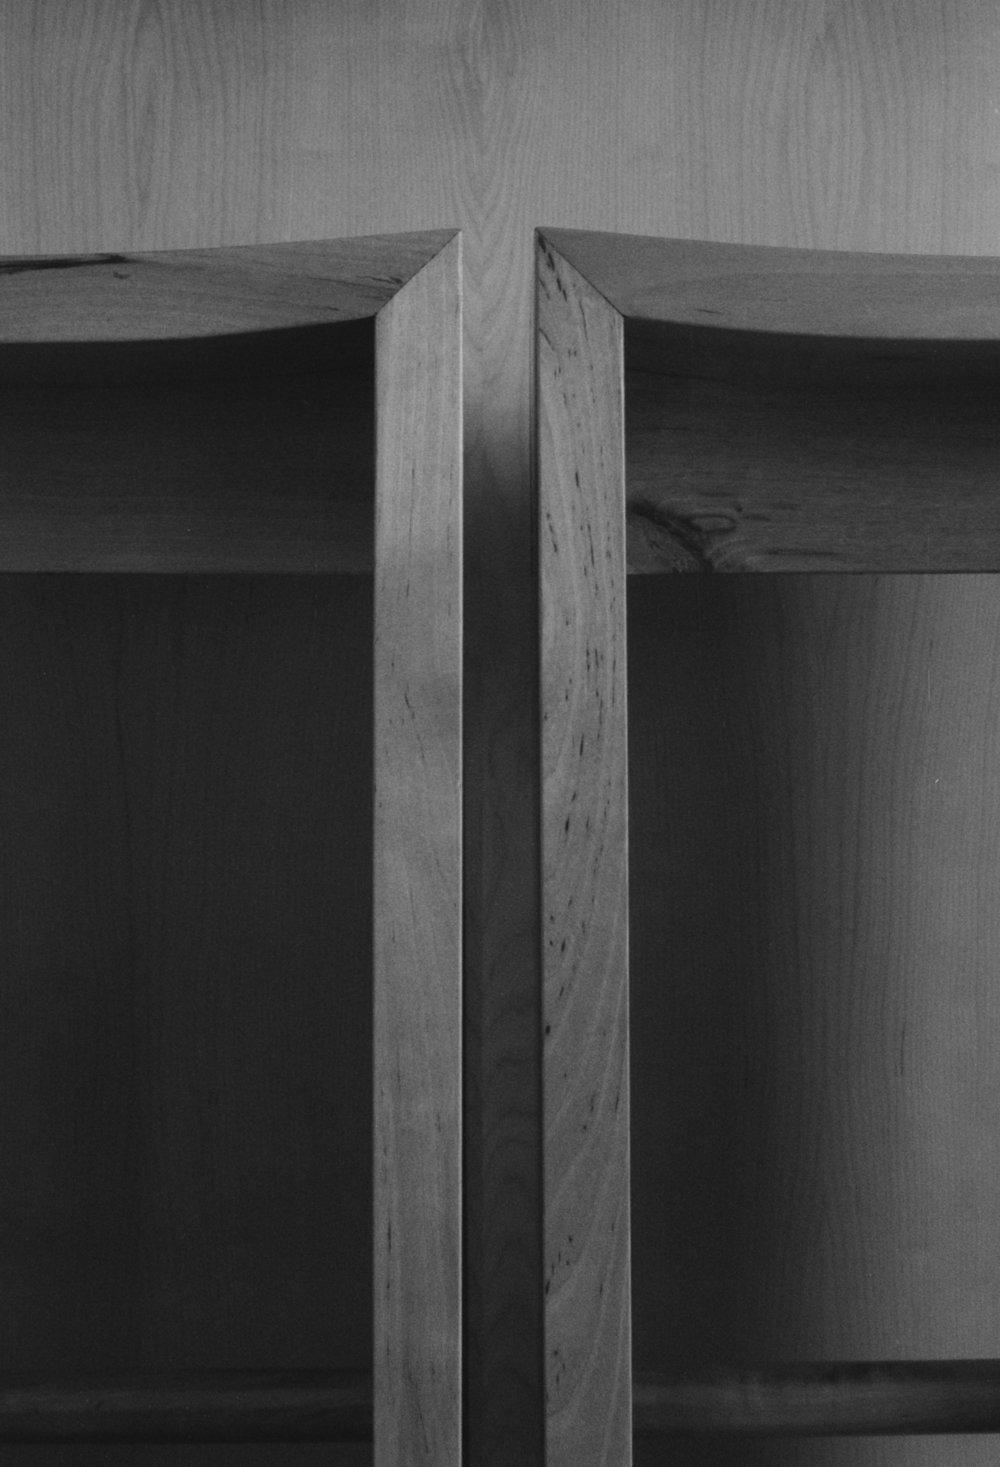 2.02 bar stool 35 mm film.jpg